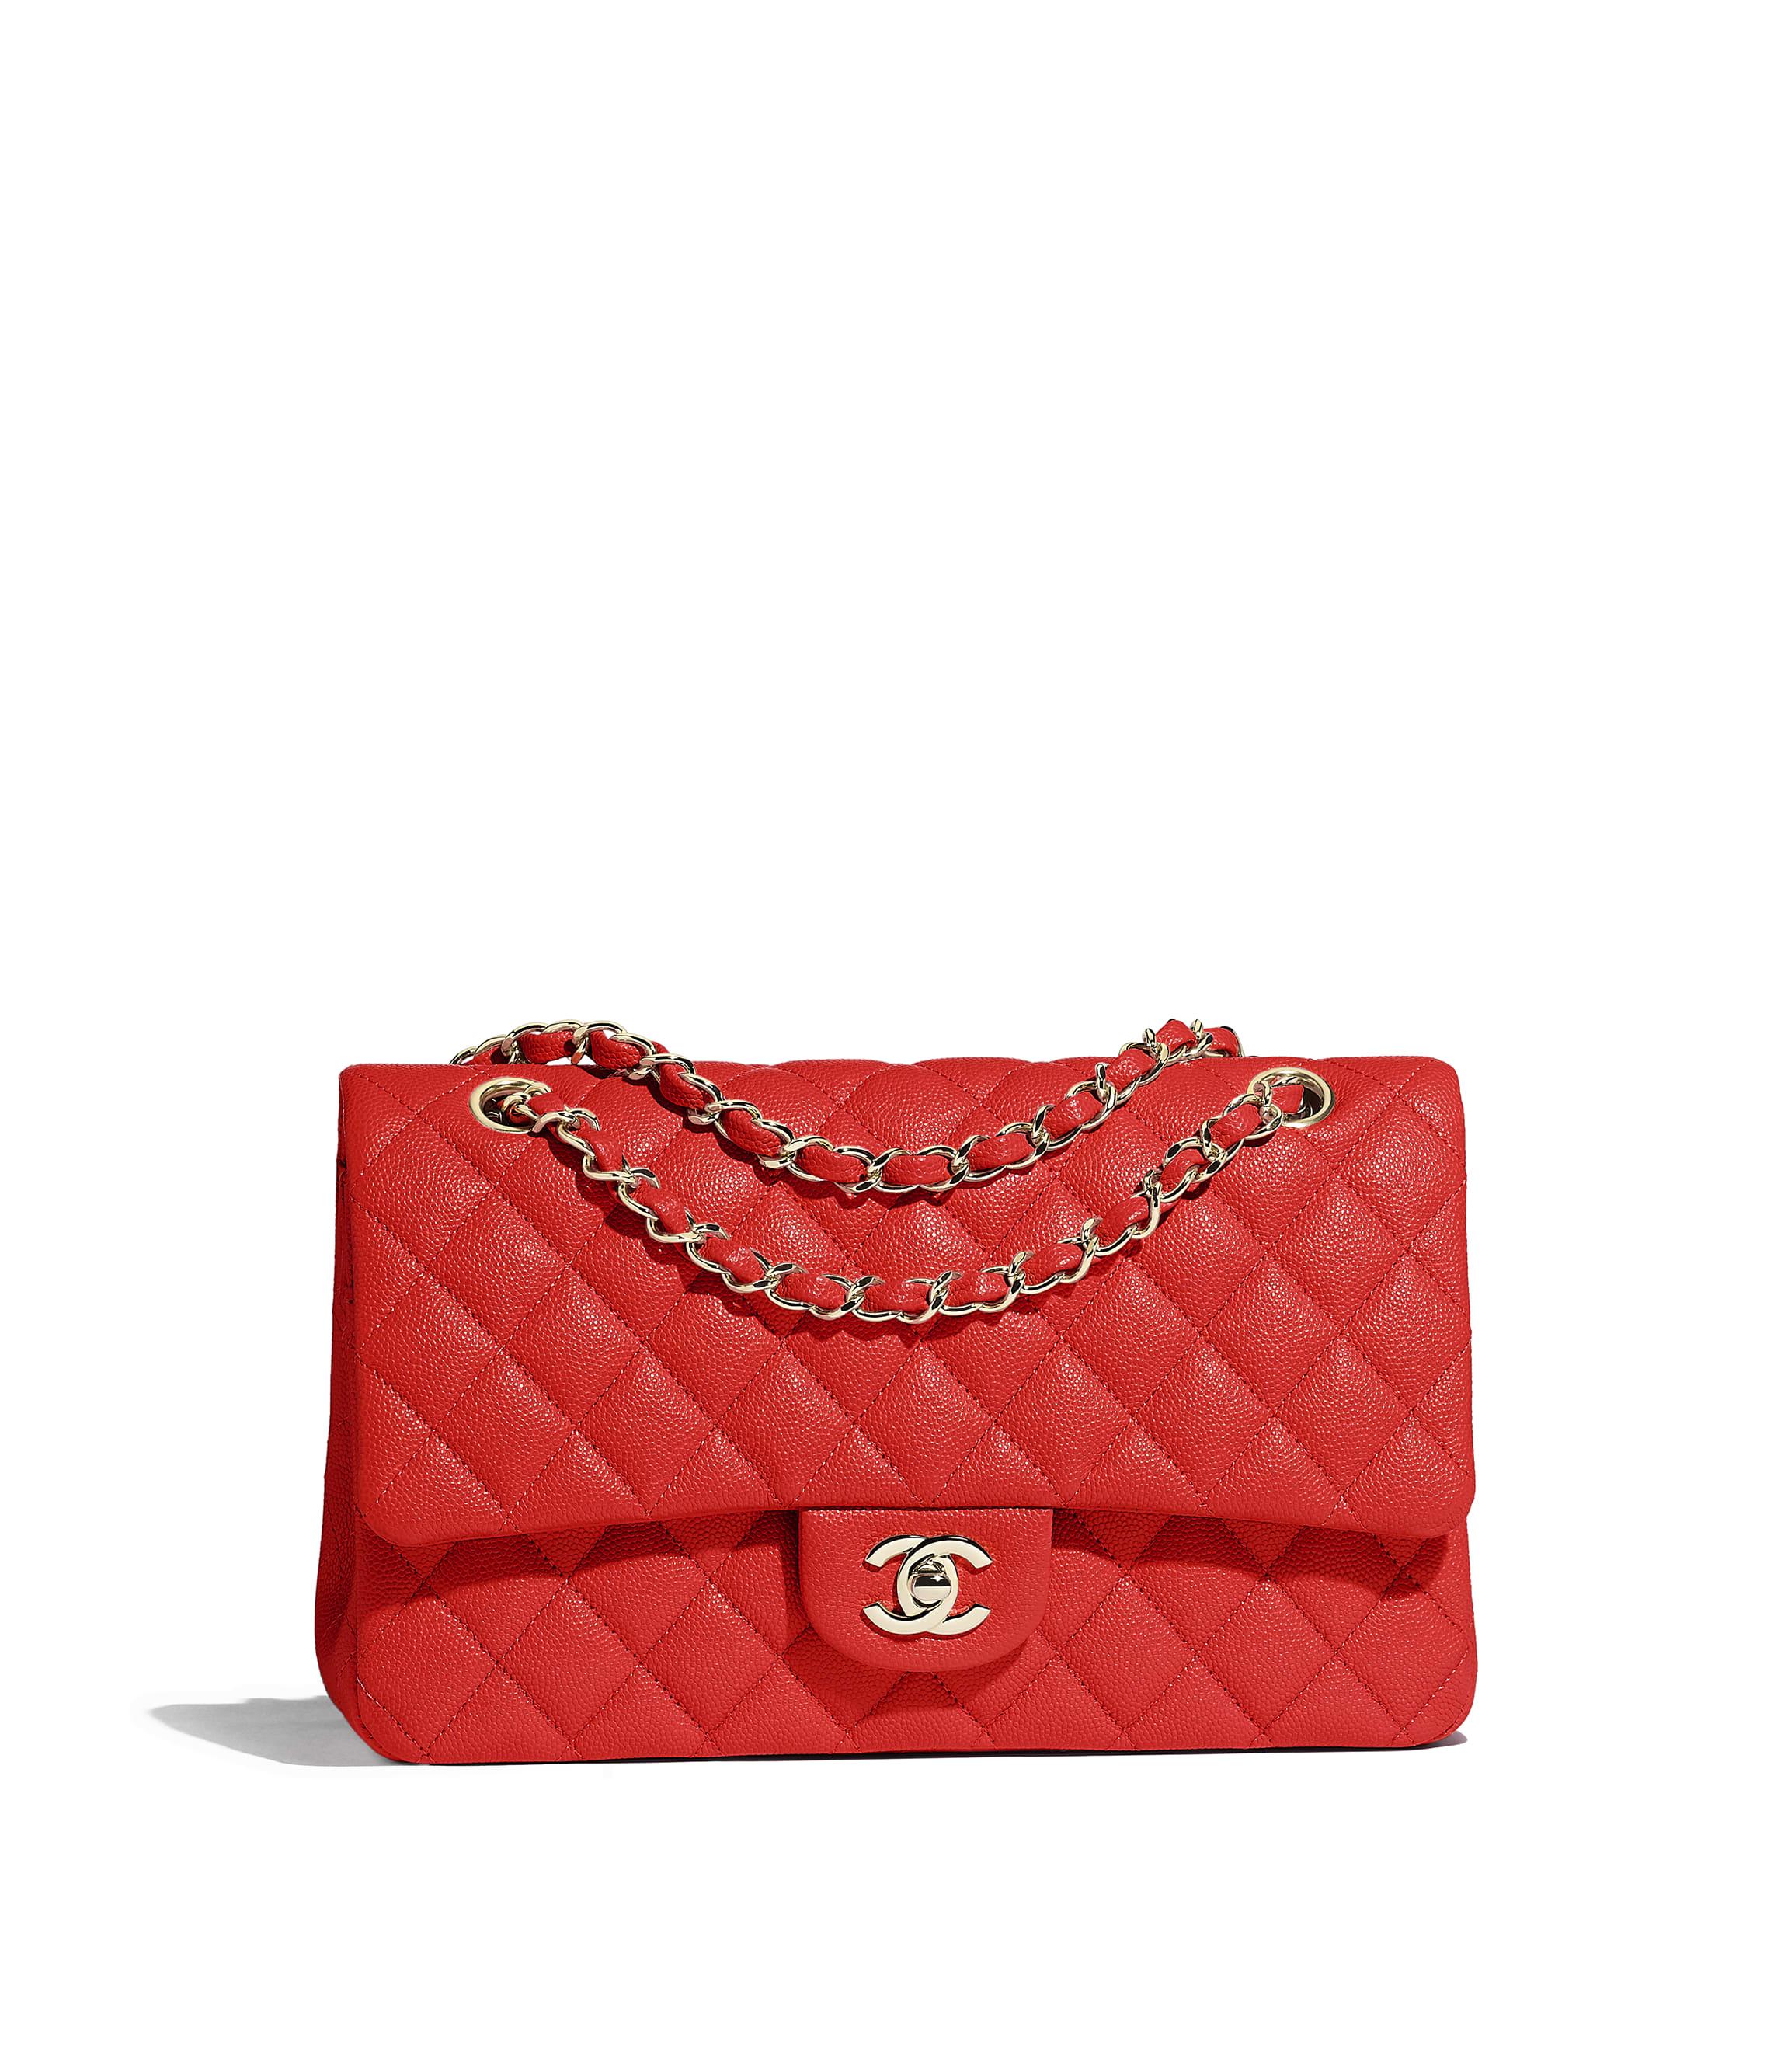 eabed1fe2d16 Classic Handbags - Handbags - CHANEL